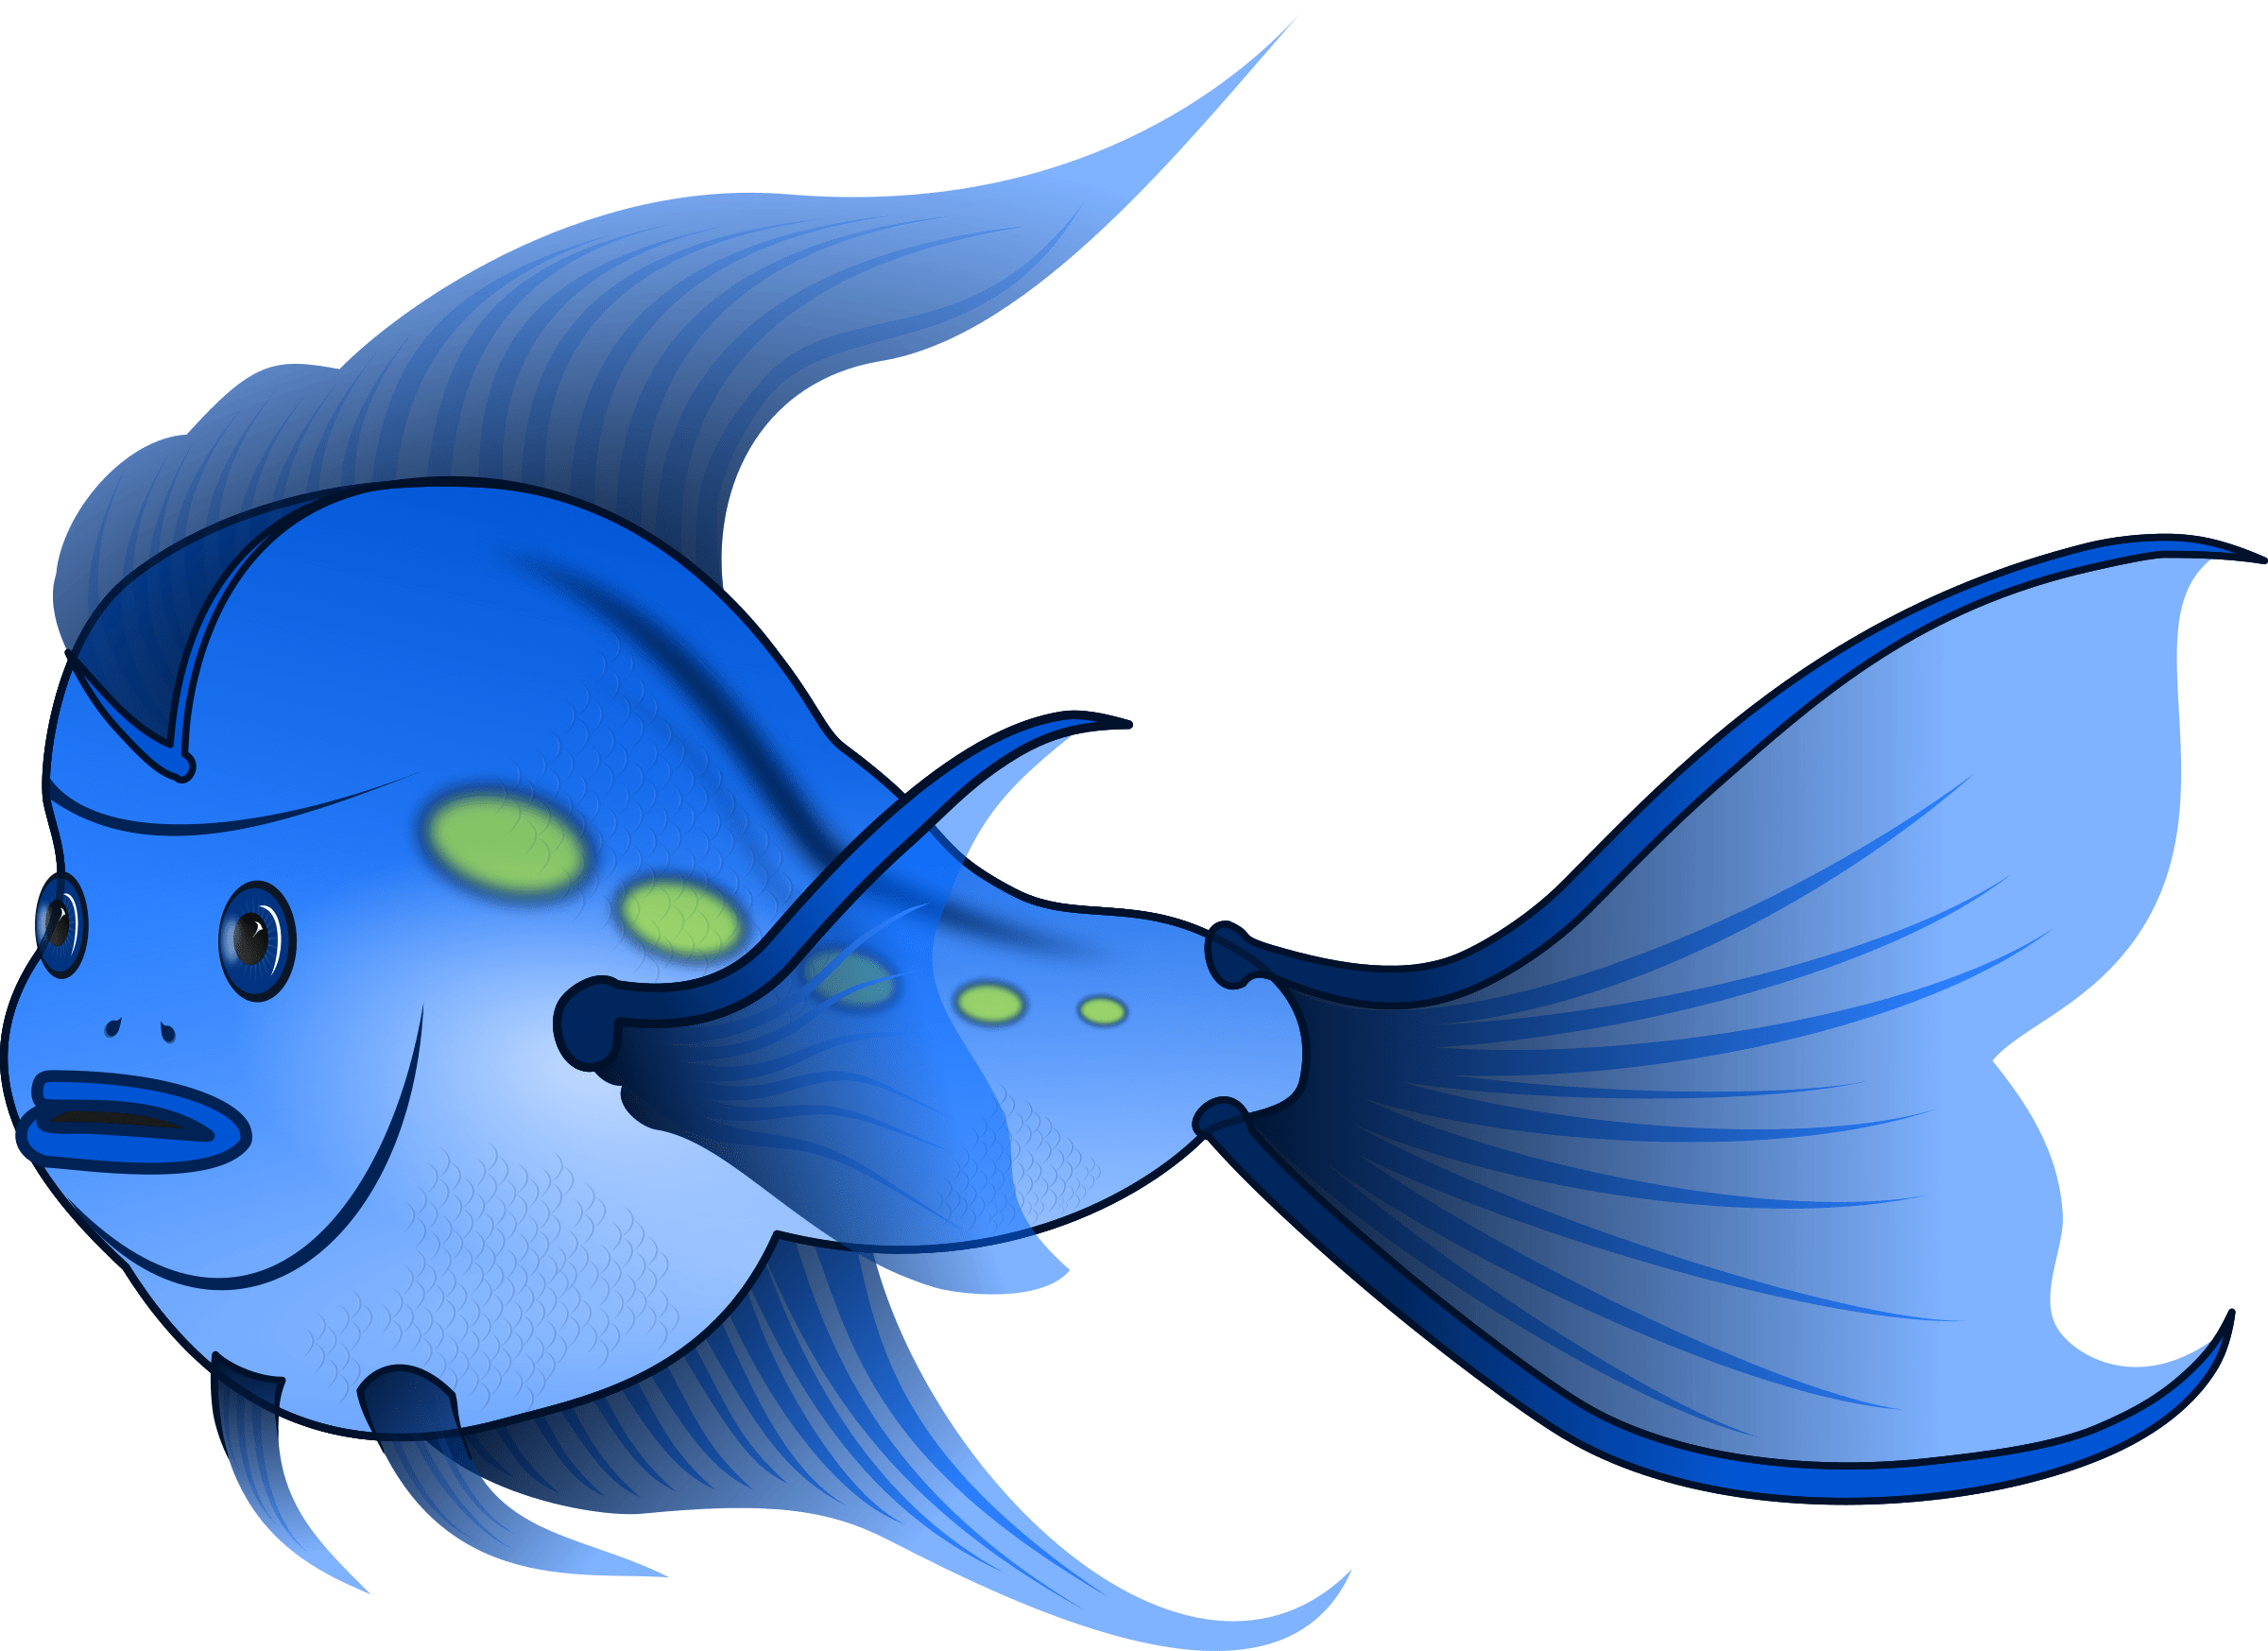 Imagenes de peces clipart royalty free stock Pez clipart 3 » Clipart Portal royalty free stock